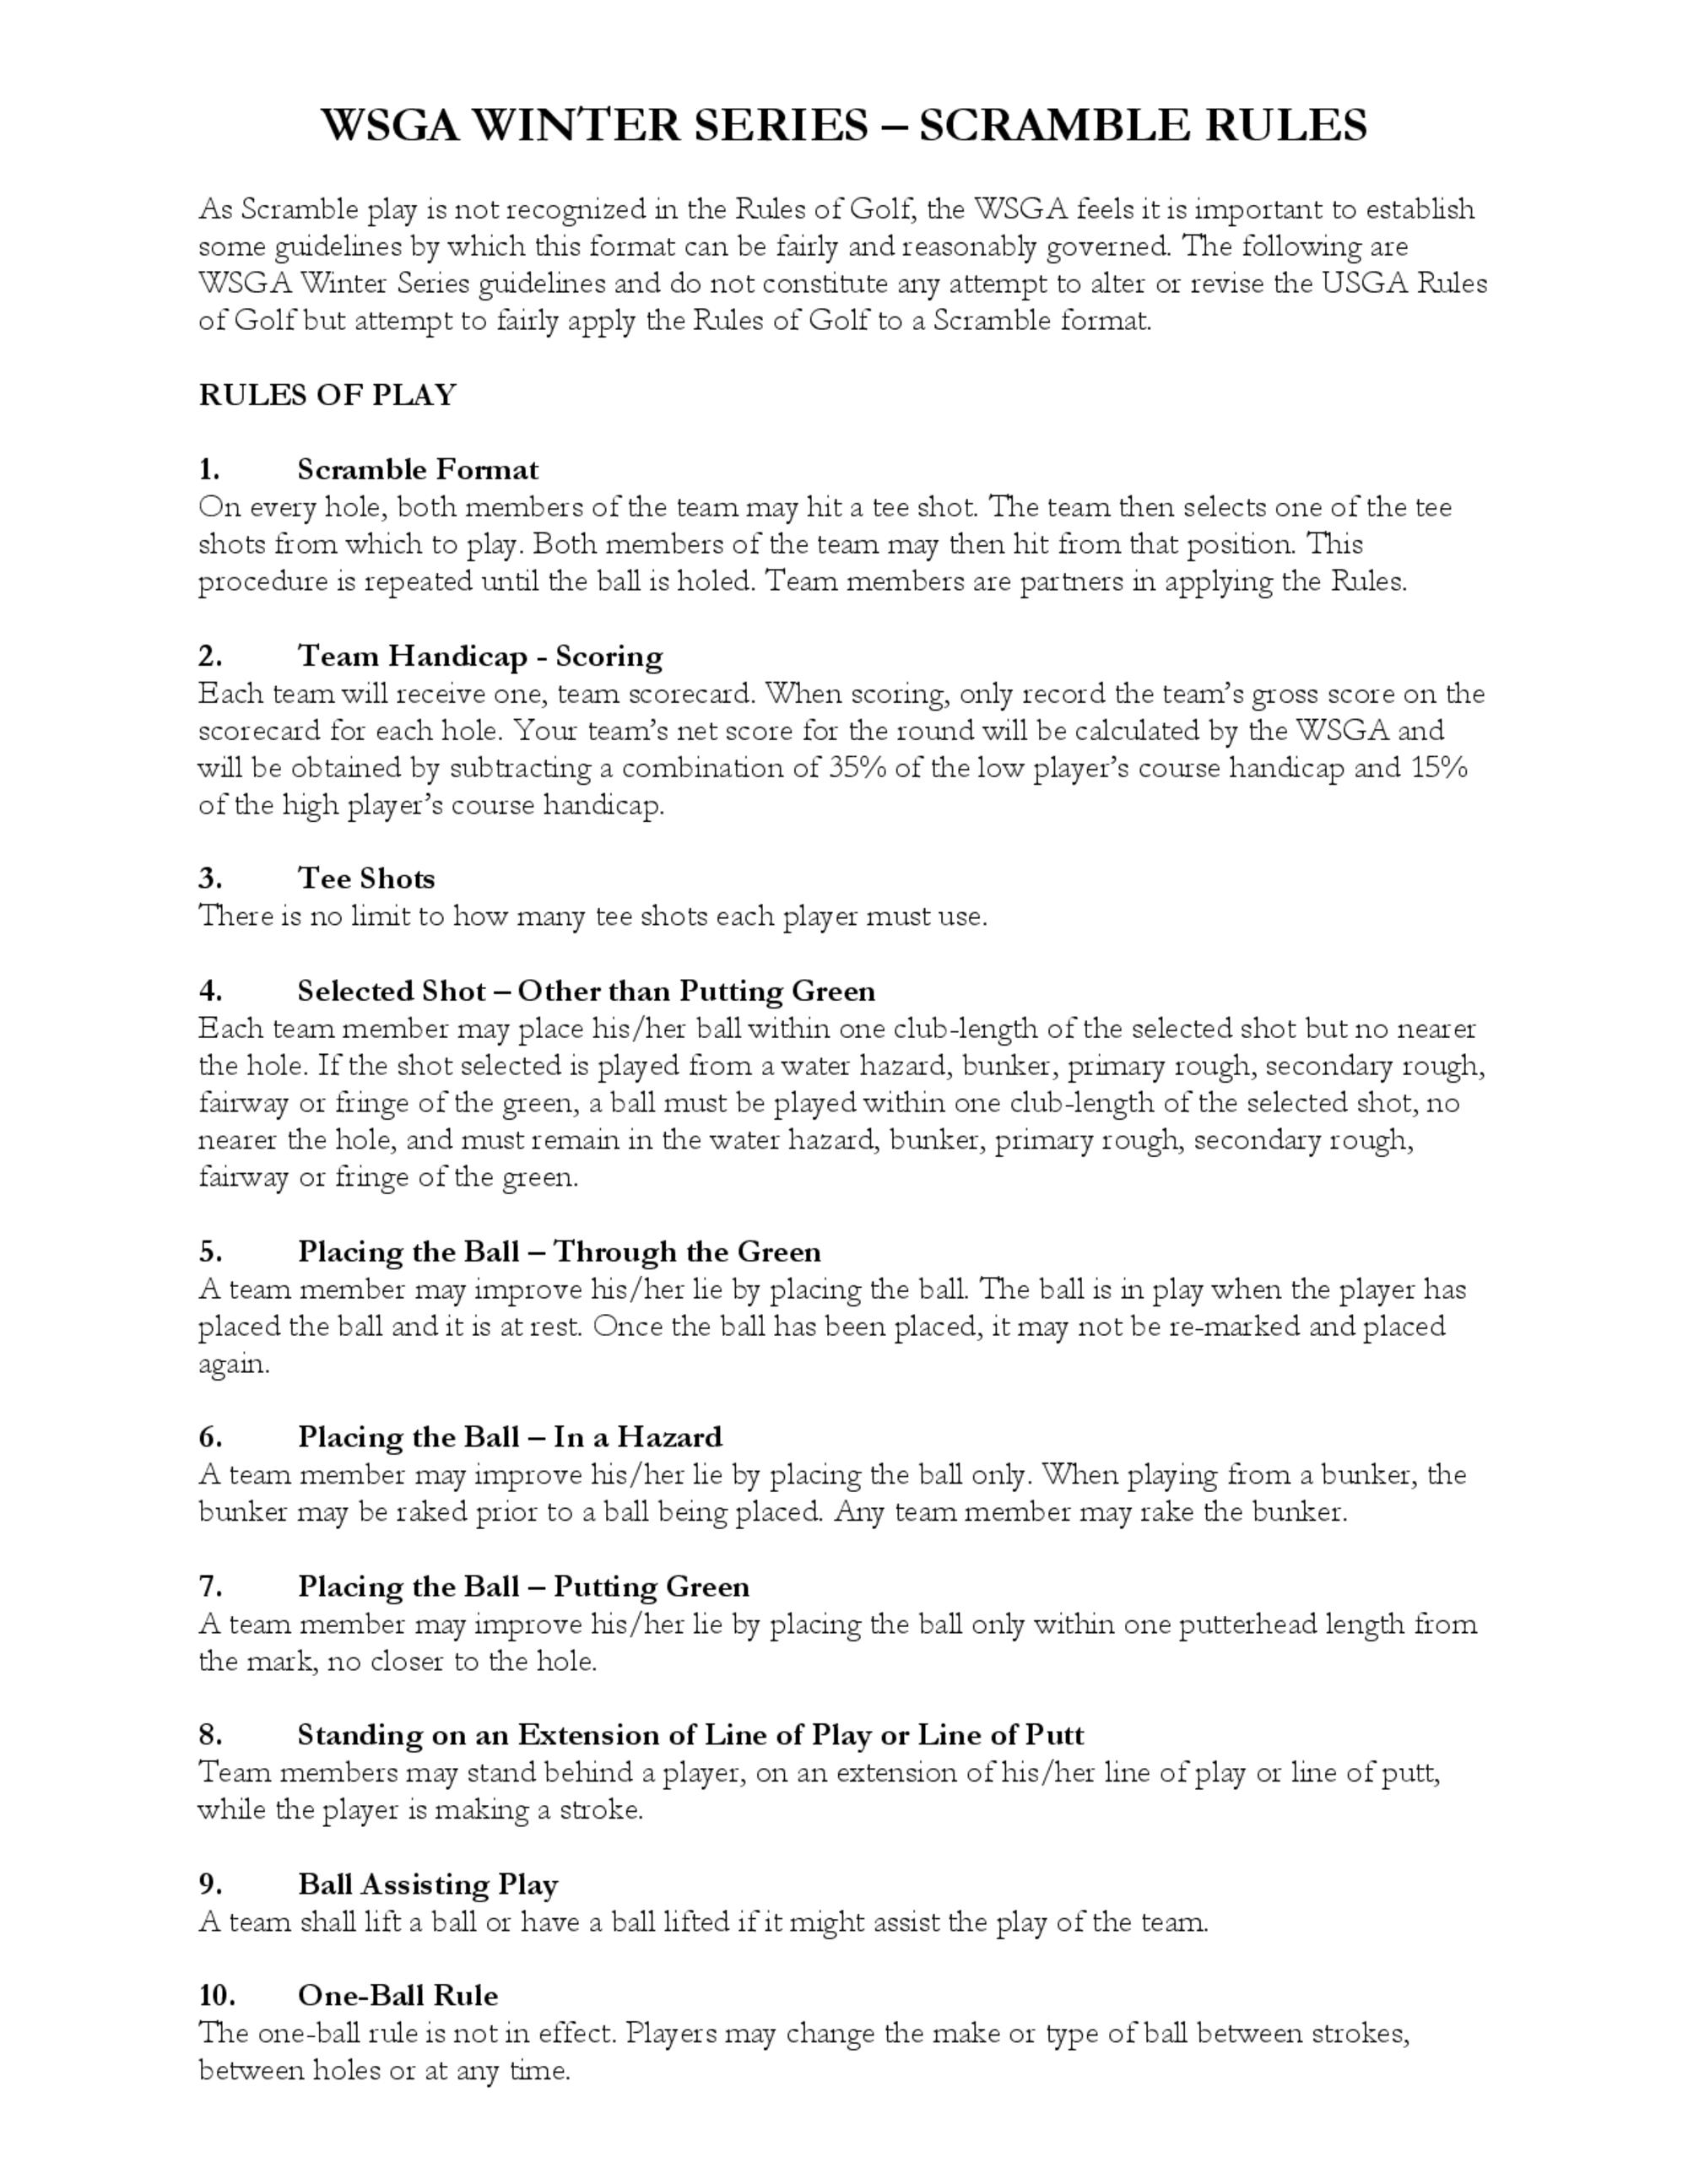 Scramble rules 1